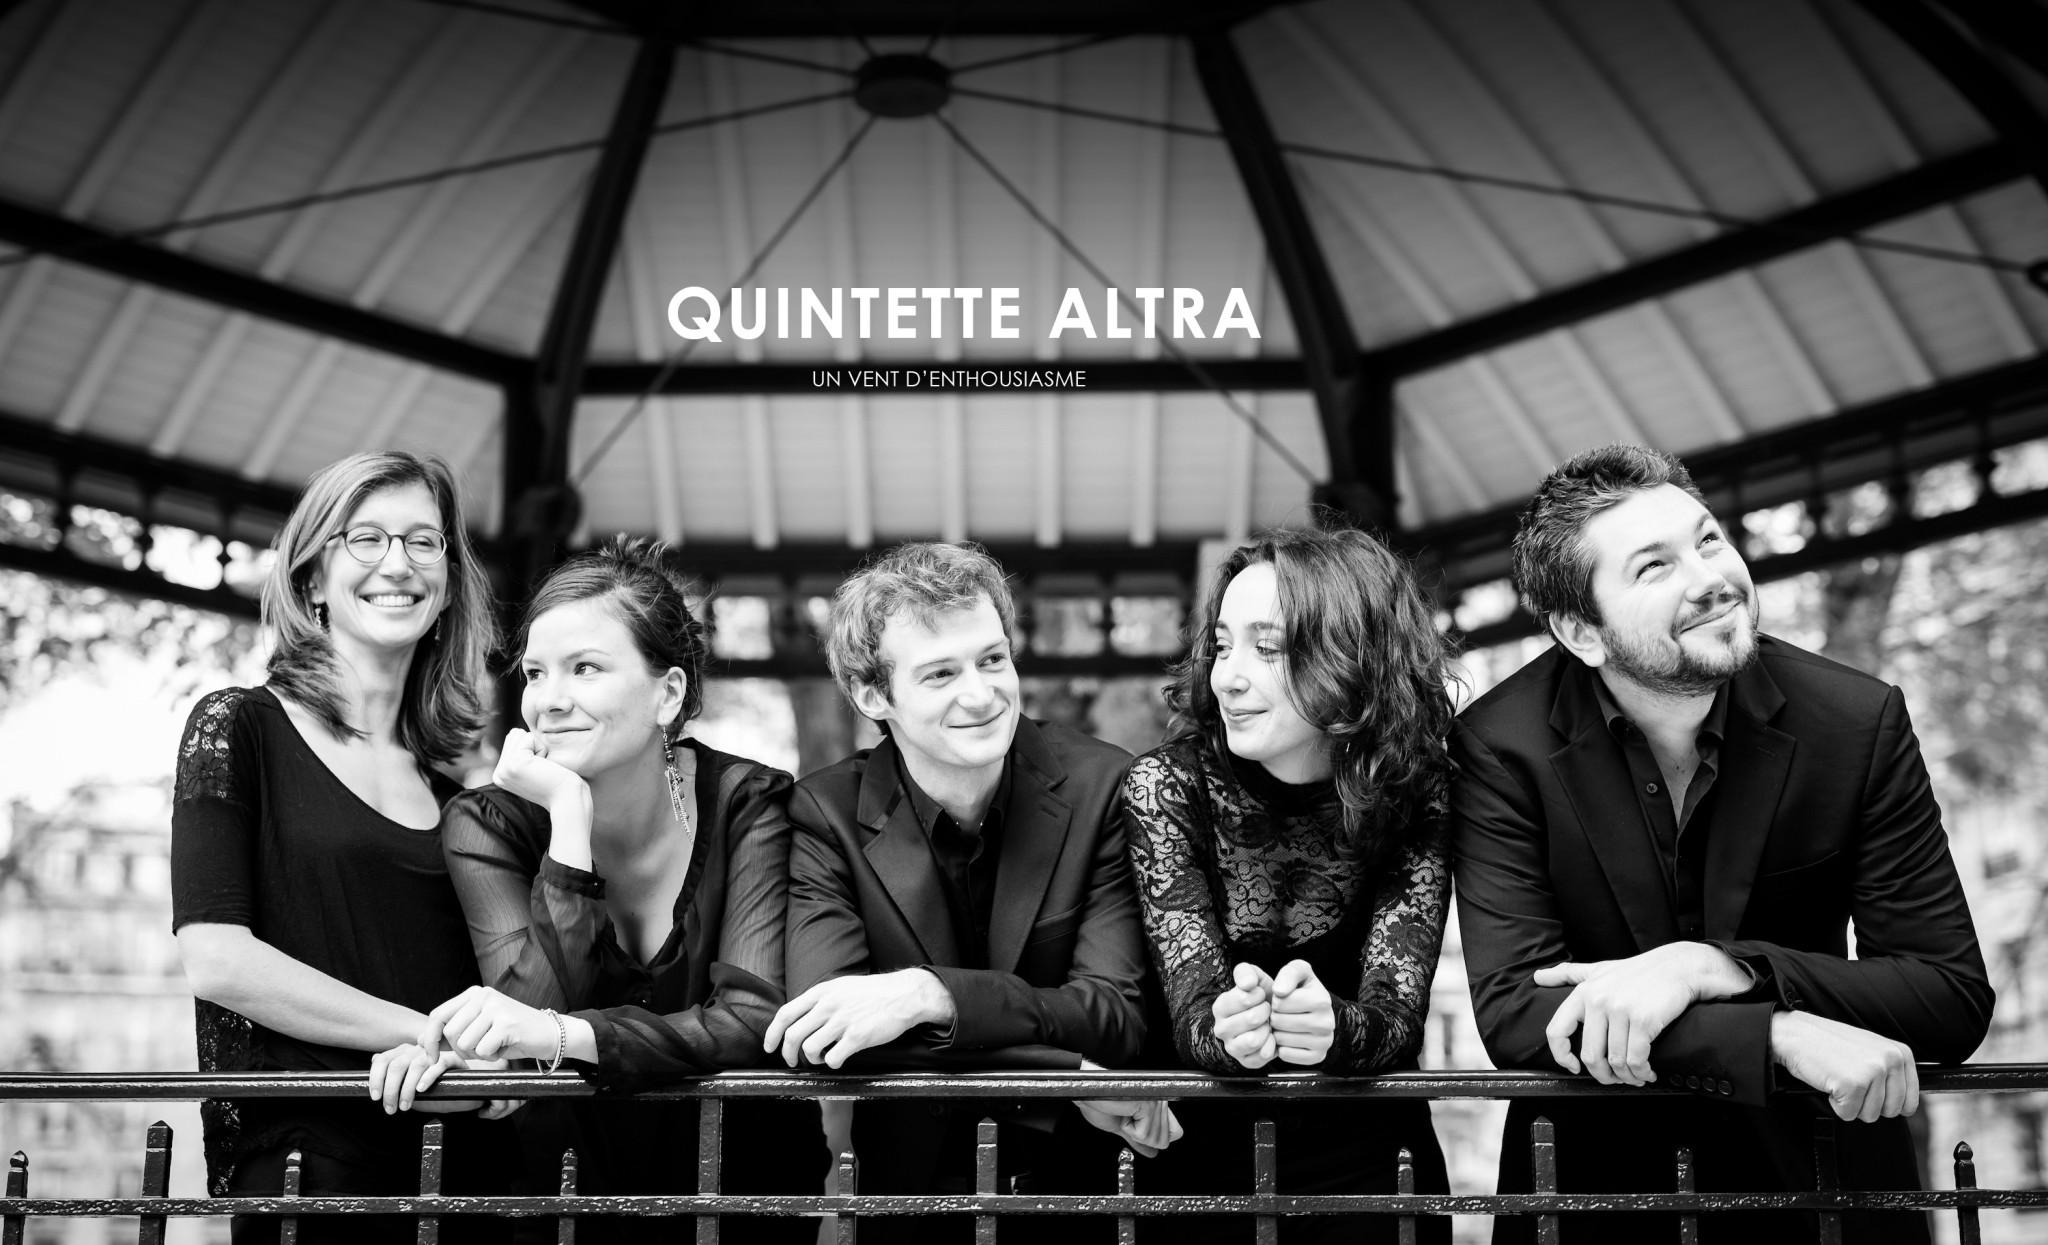 Quintette Altra